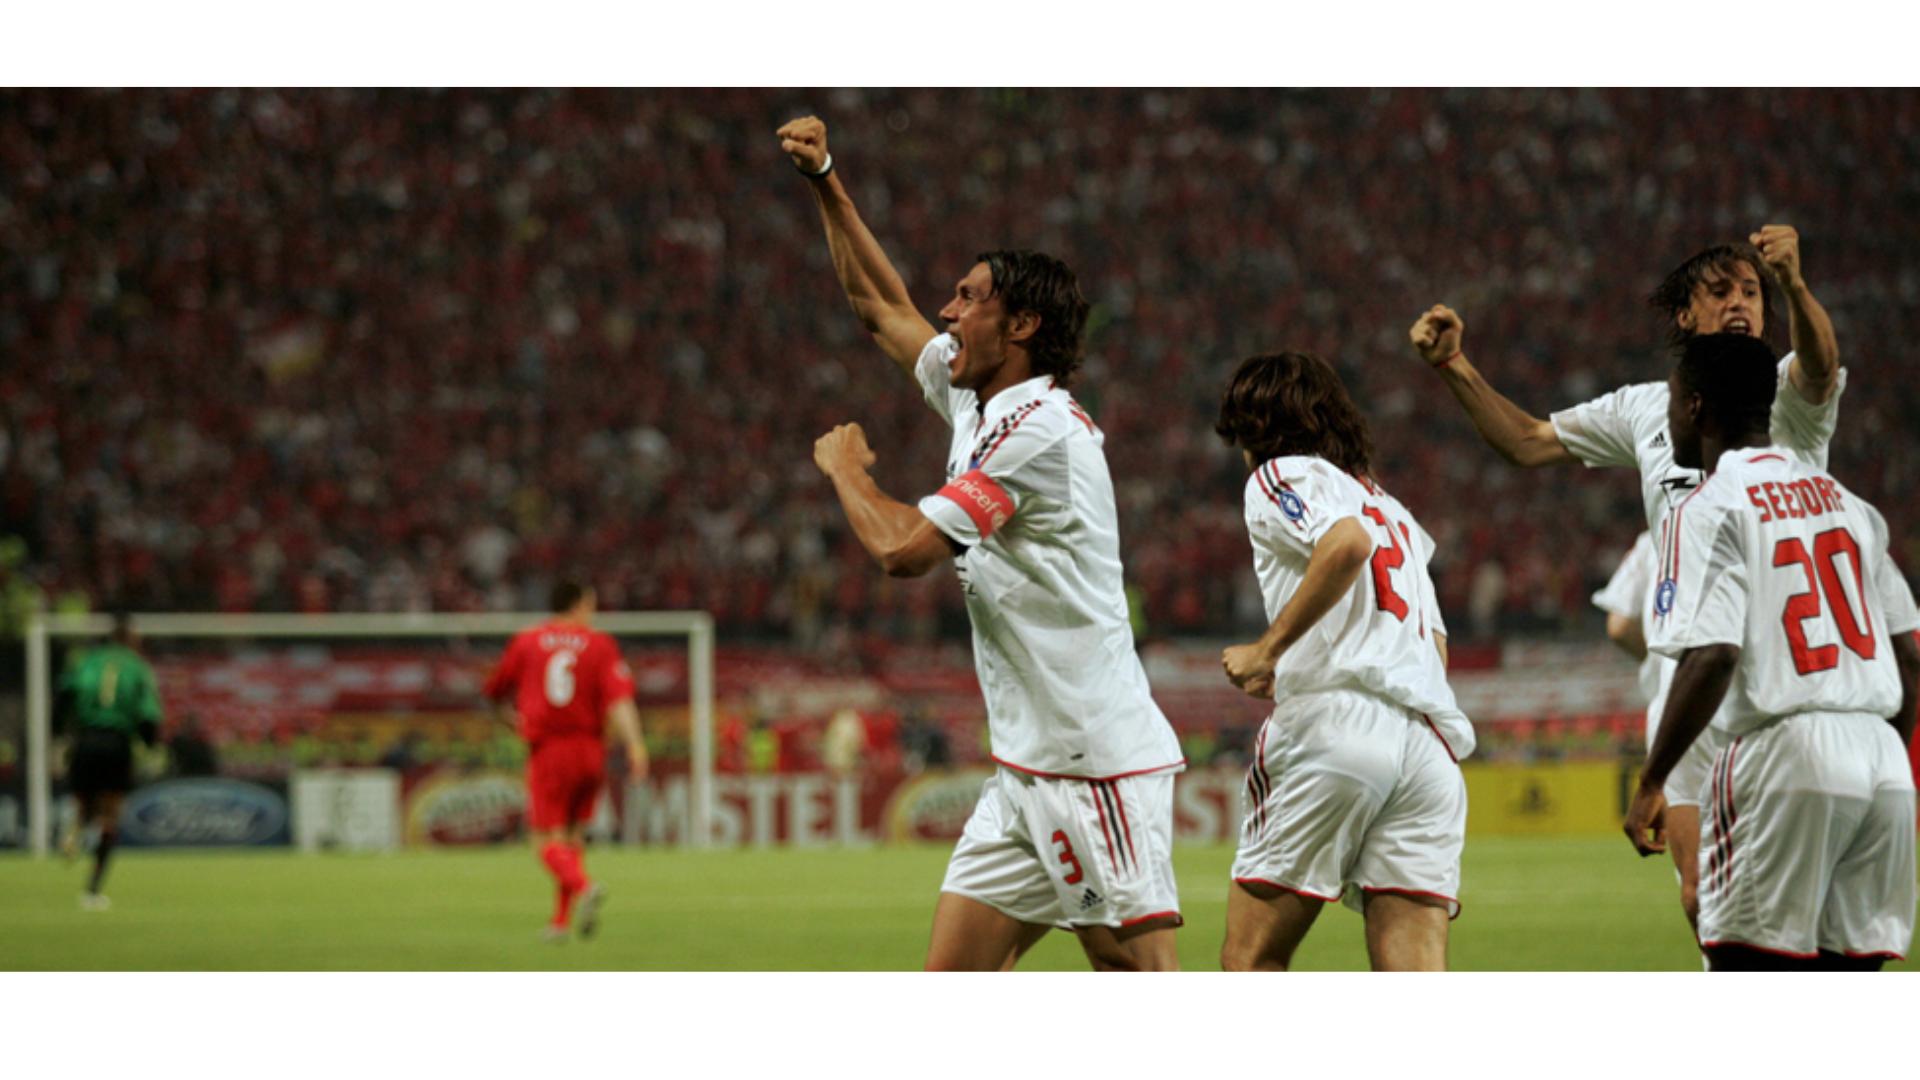 Maldini'nin gol sevinci yaşadığı ana ait bir görsel.